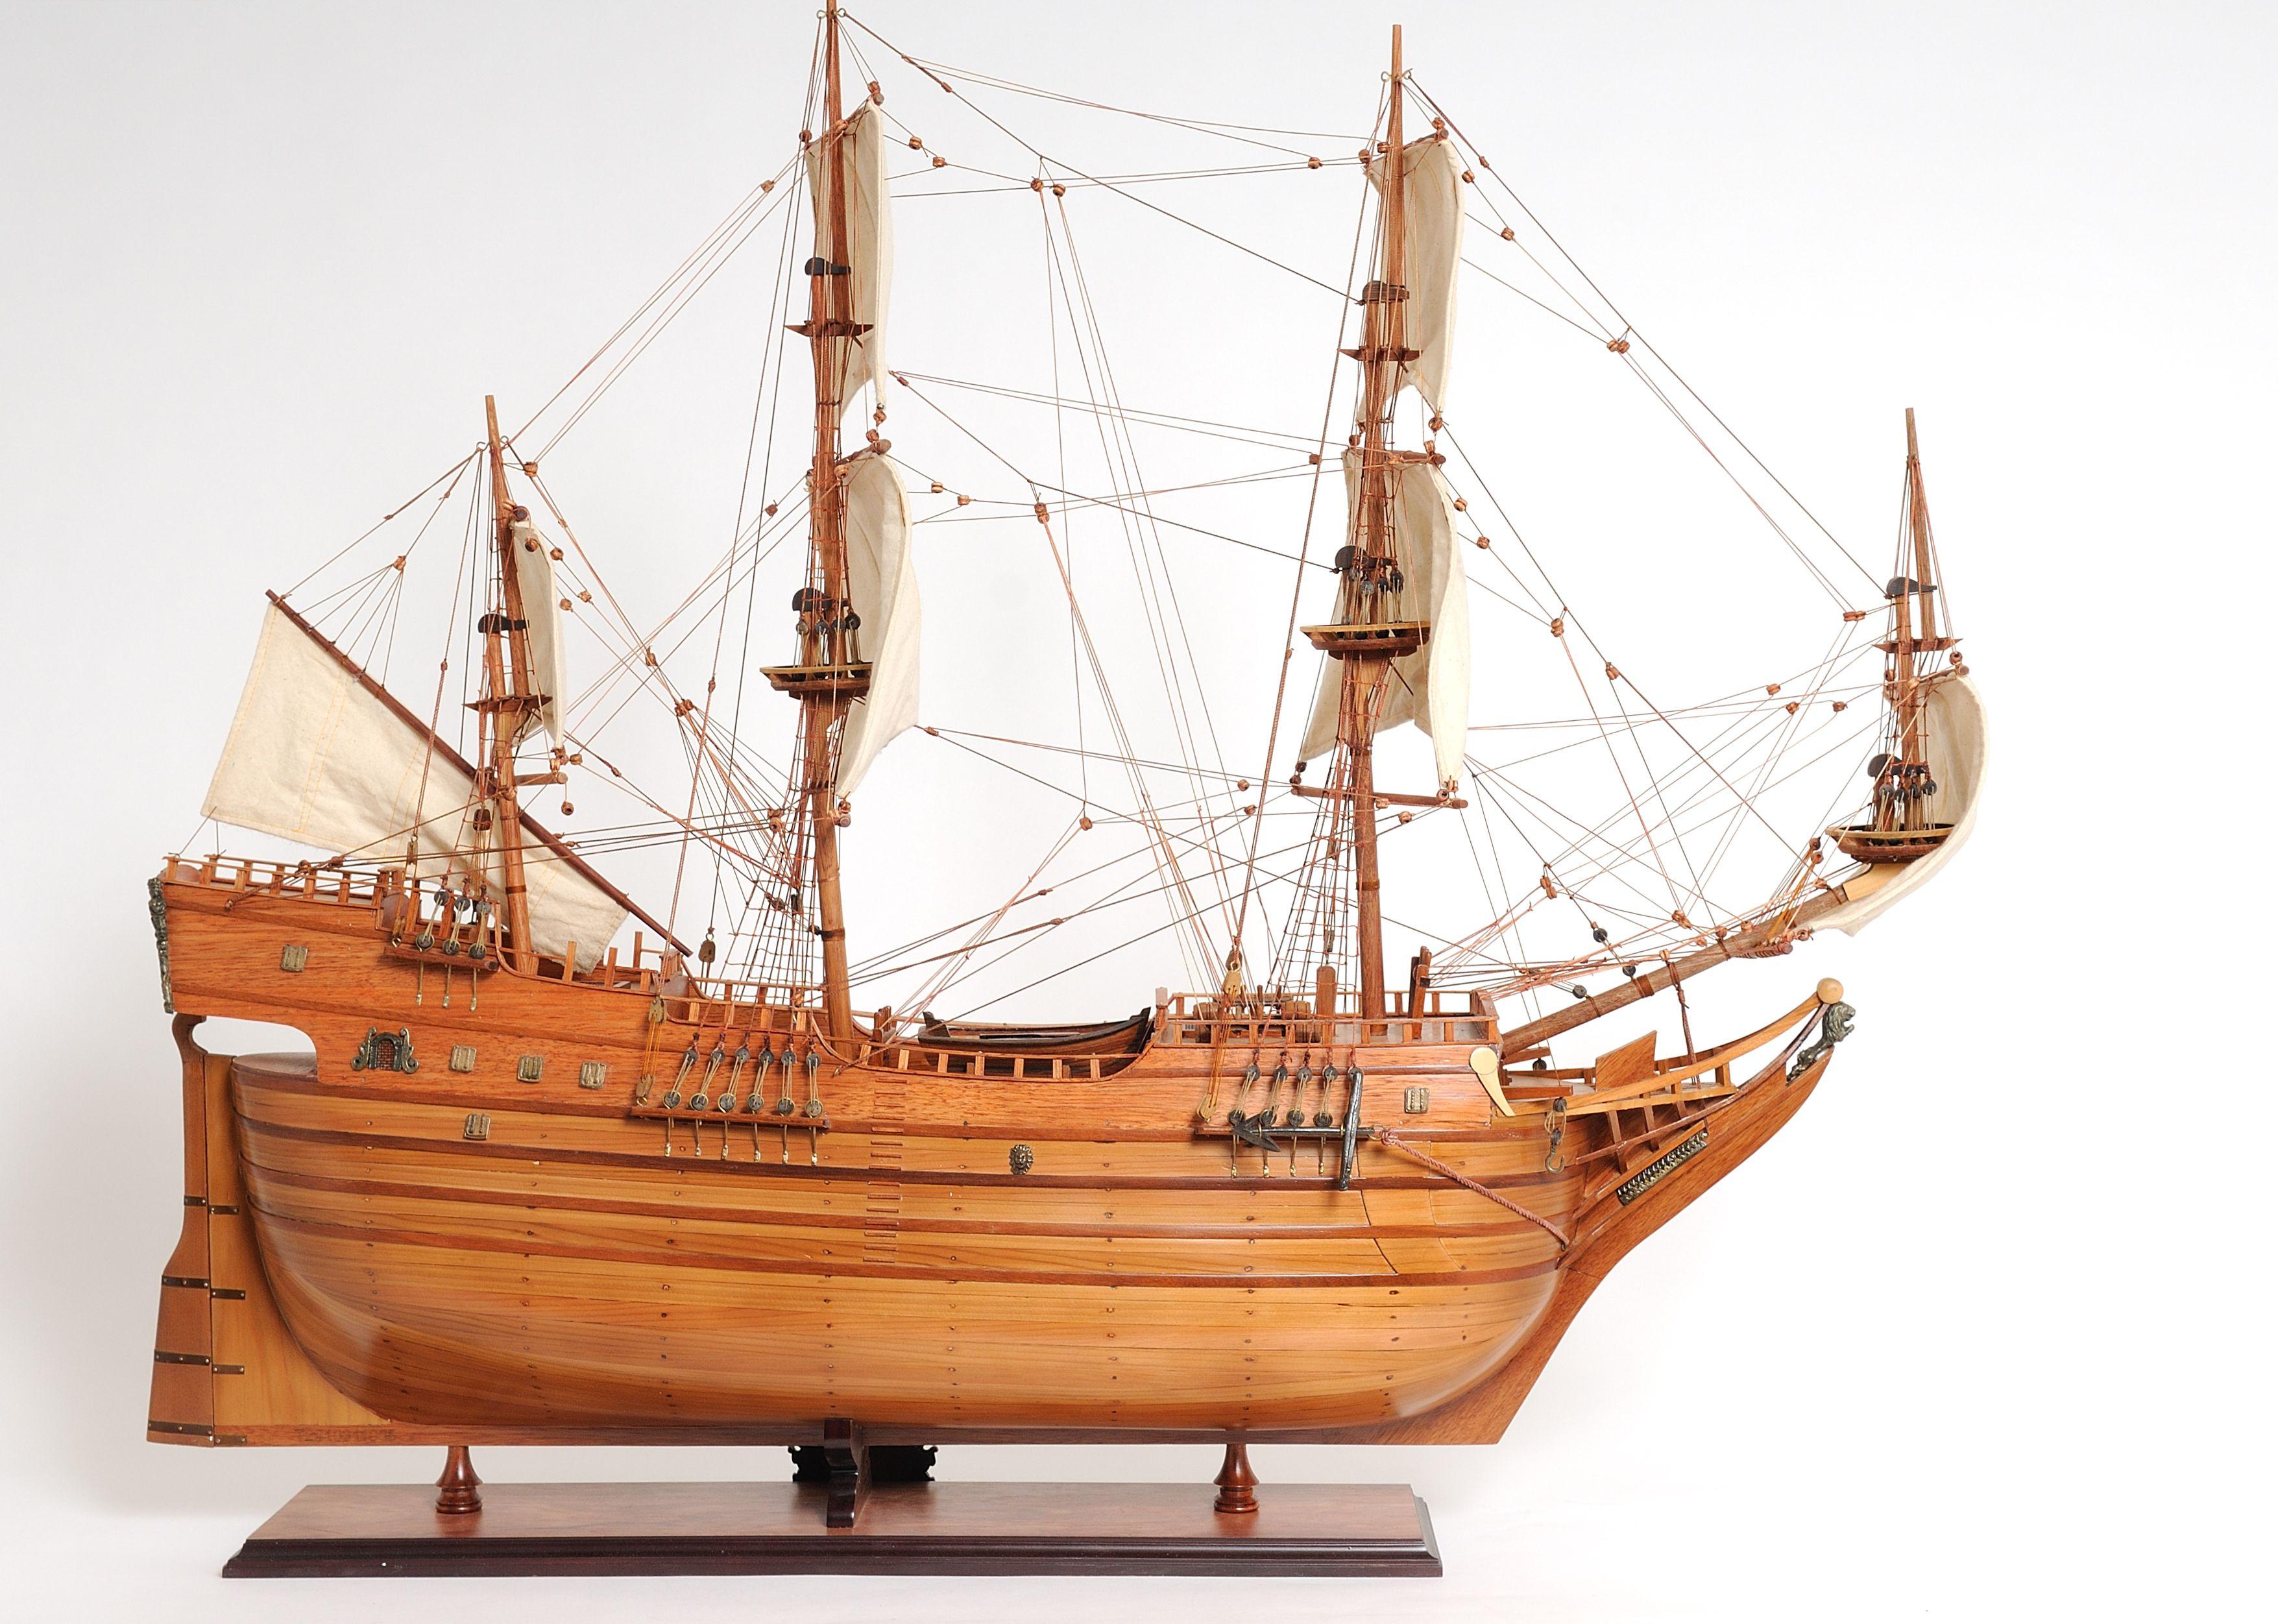 2277-12990-Arabella-Model-Ship